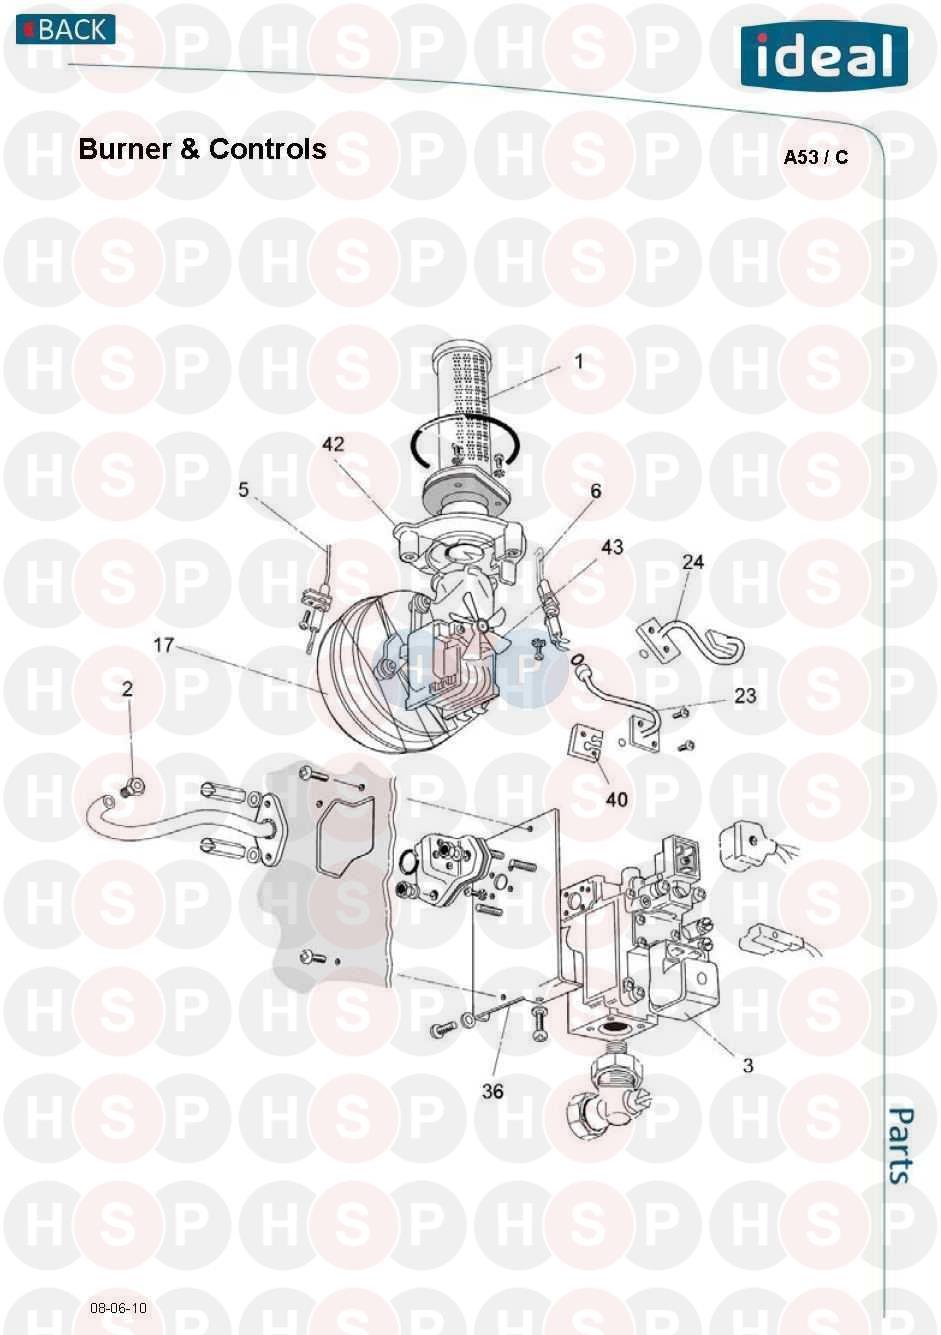 Ideal MINIMISER 80FF Appliance Diagram (BURNER & CONTROLS